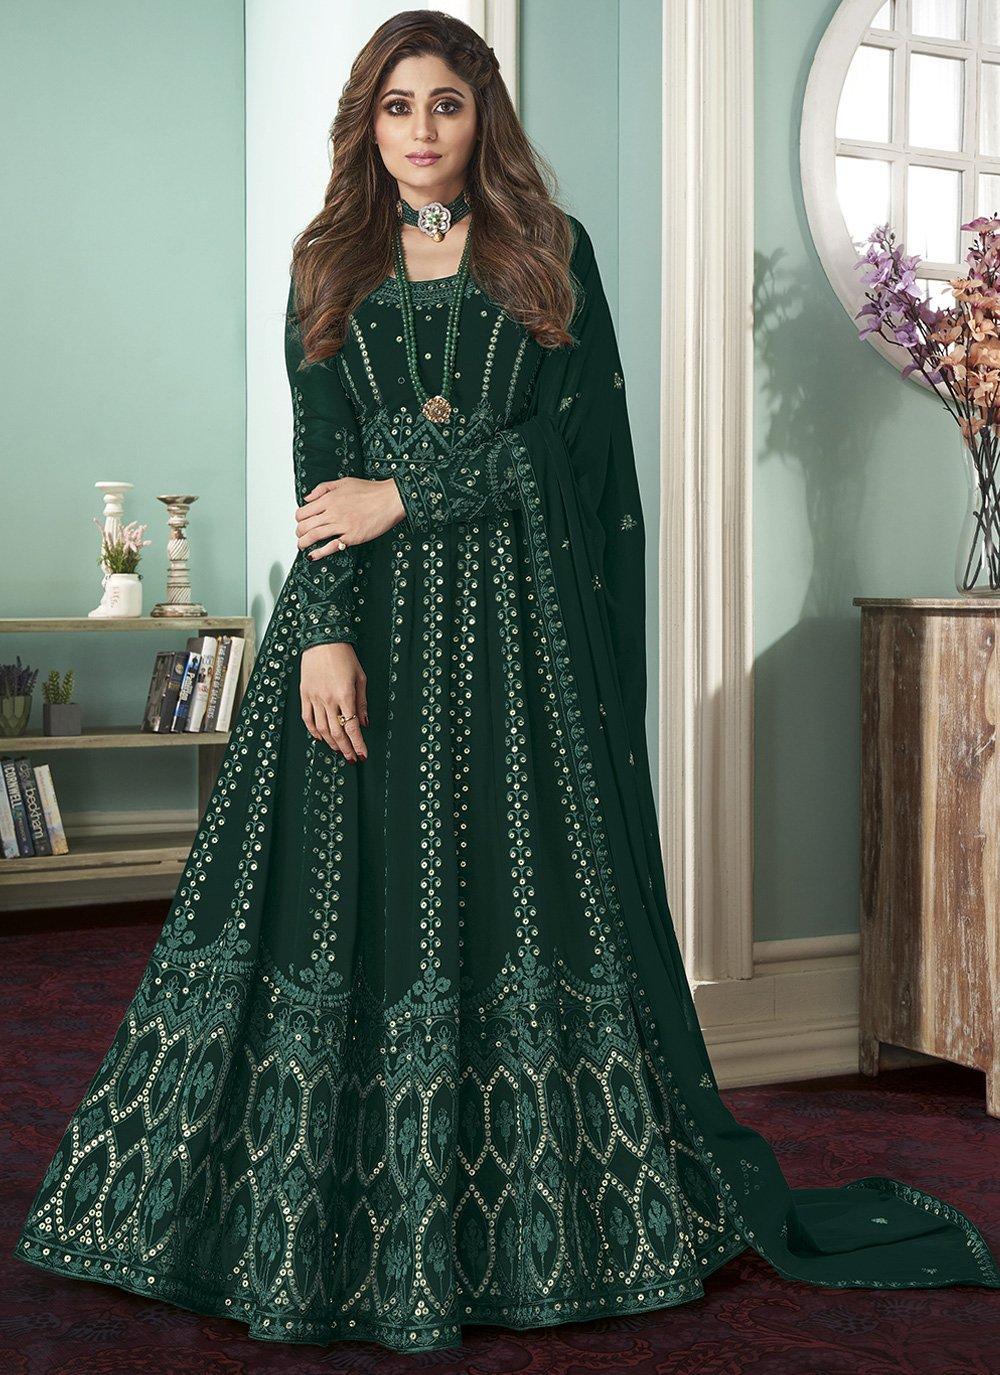 Resham Georgette Bollywood Salwar Kameez